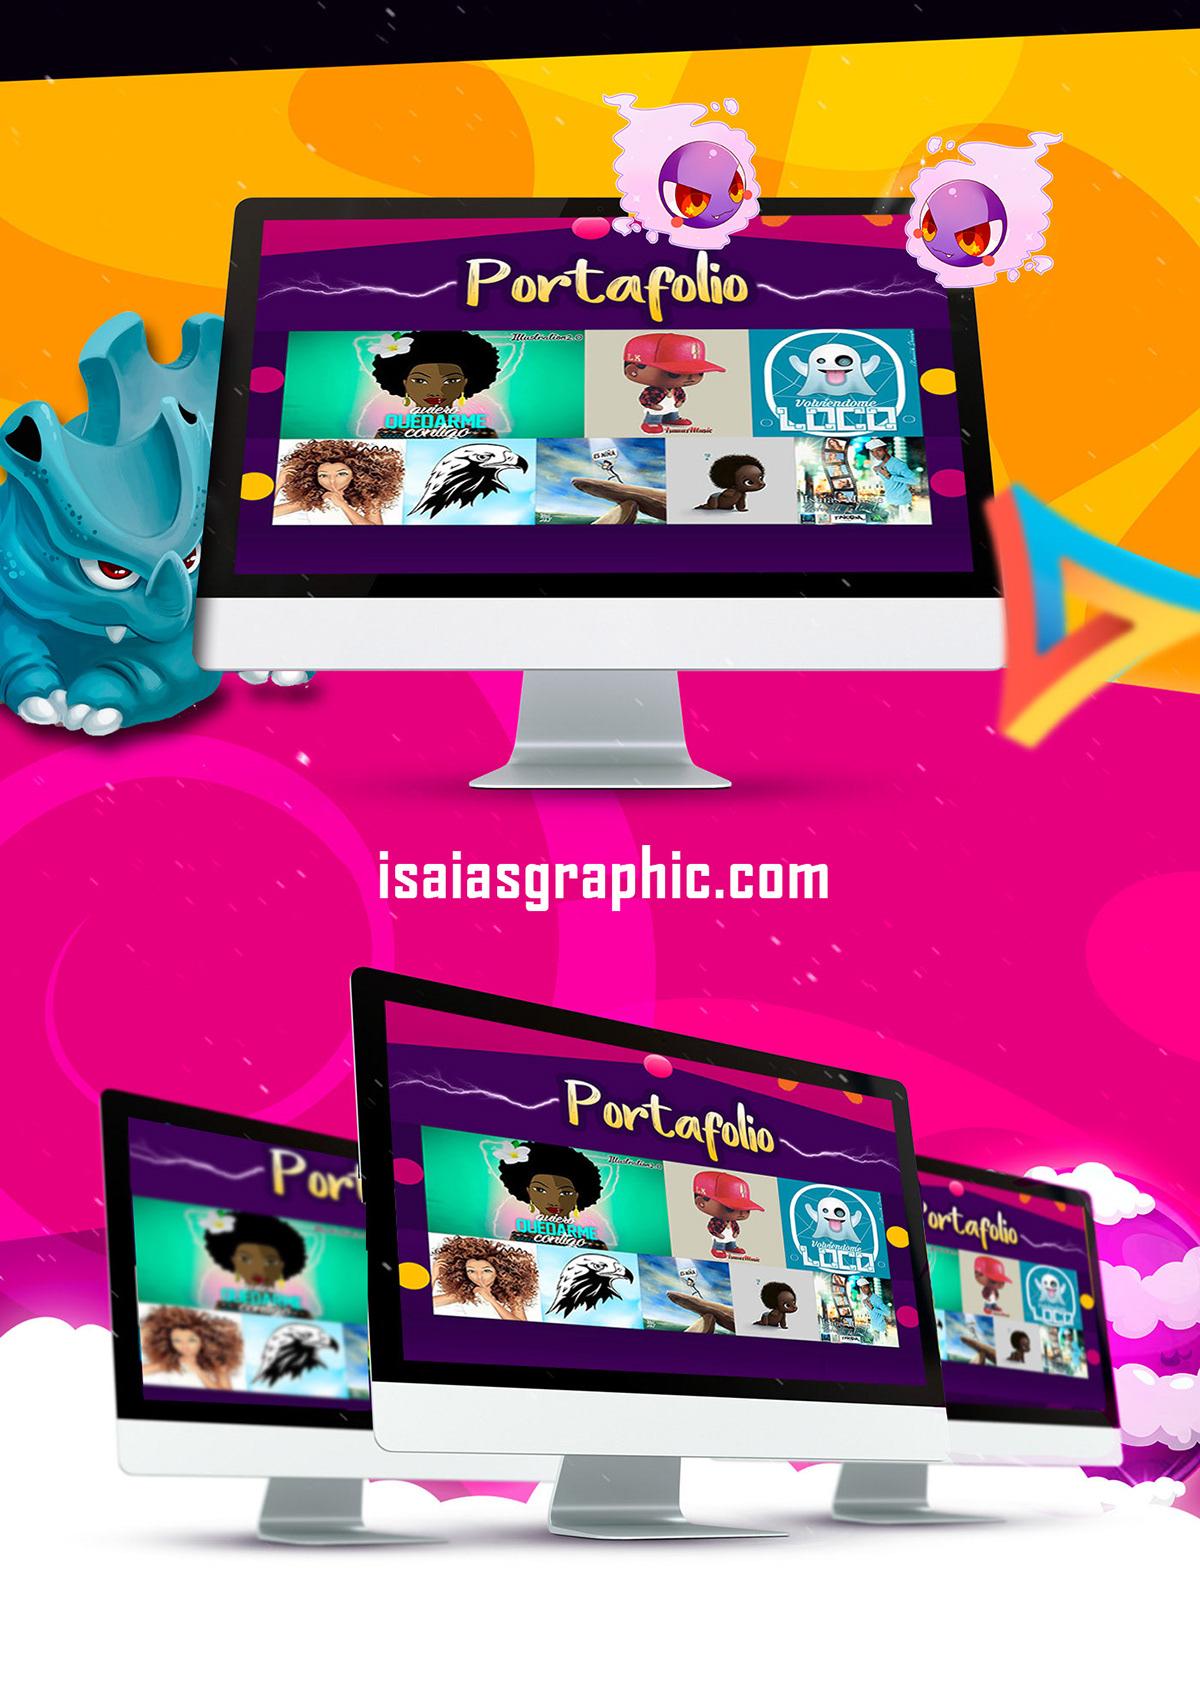 Web Curriculum Vitae 2 1 Isaias Graphic On Pantone Canvas Gallery